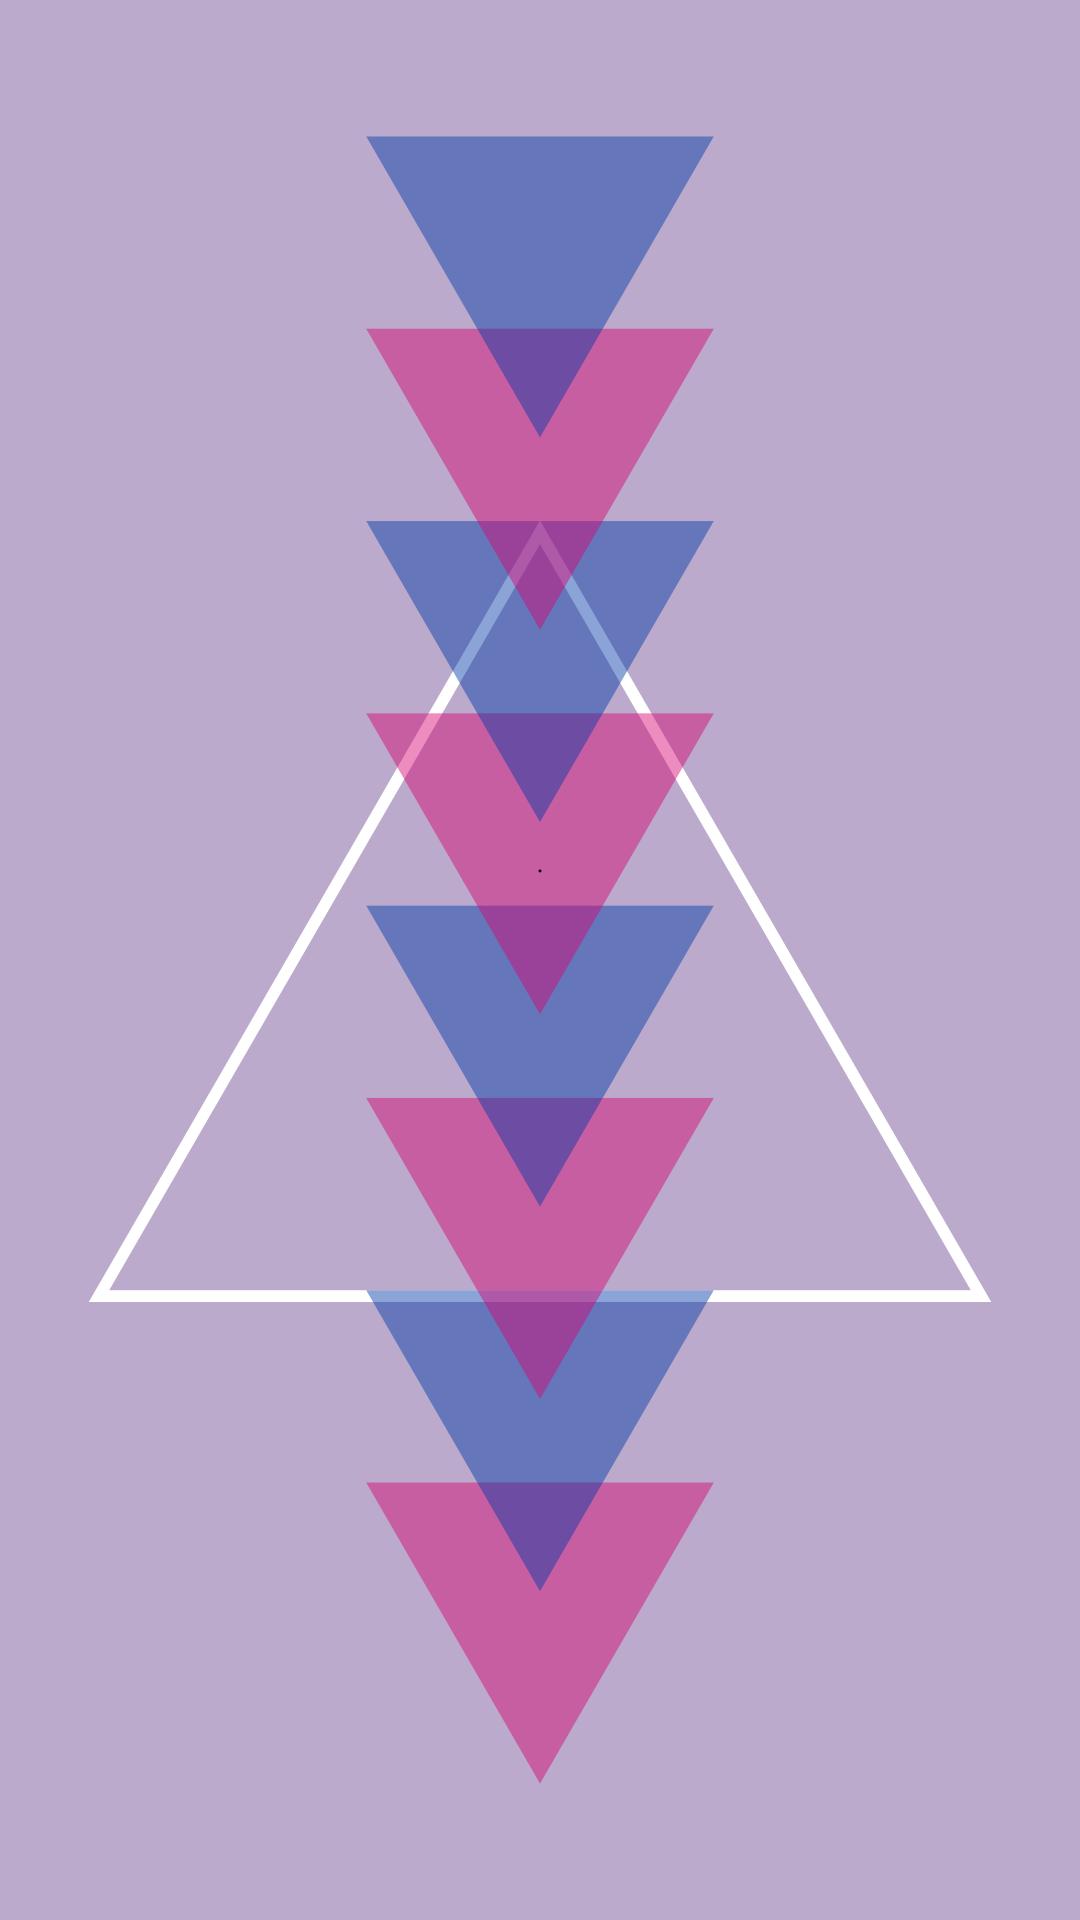 Bisexual Aesthetic - HD Wallpaper